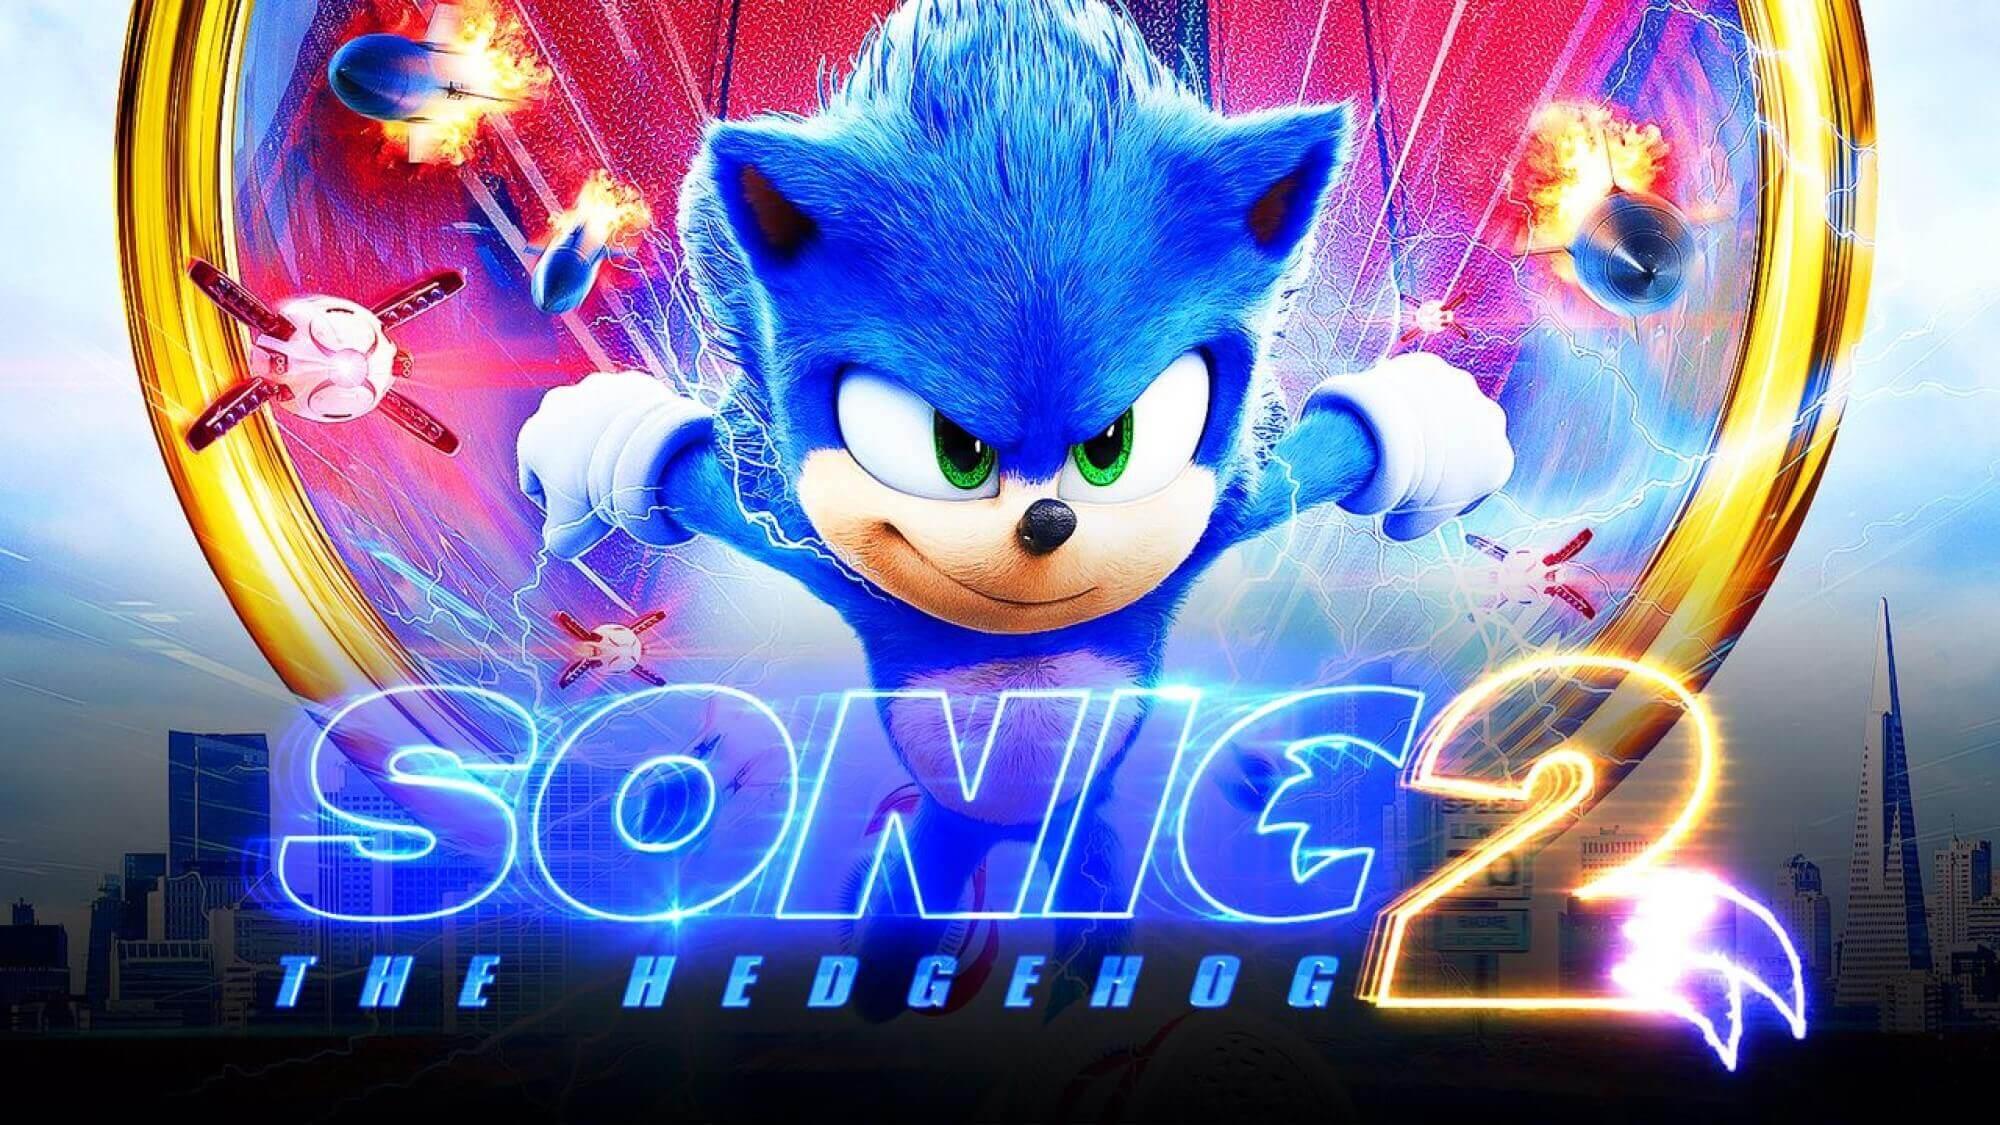 sonic the hedgehog movie 2 plot leaked